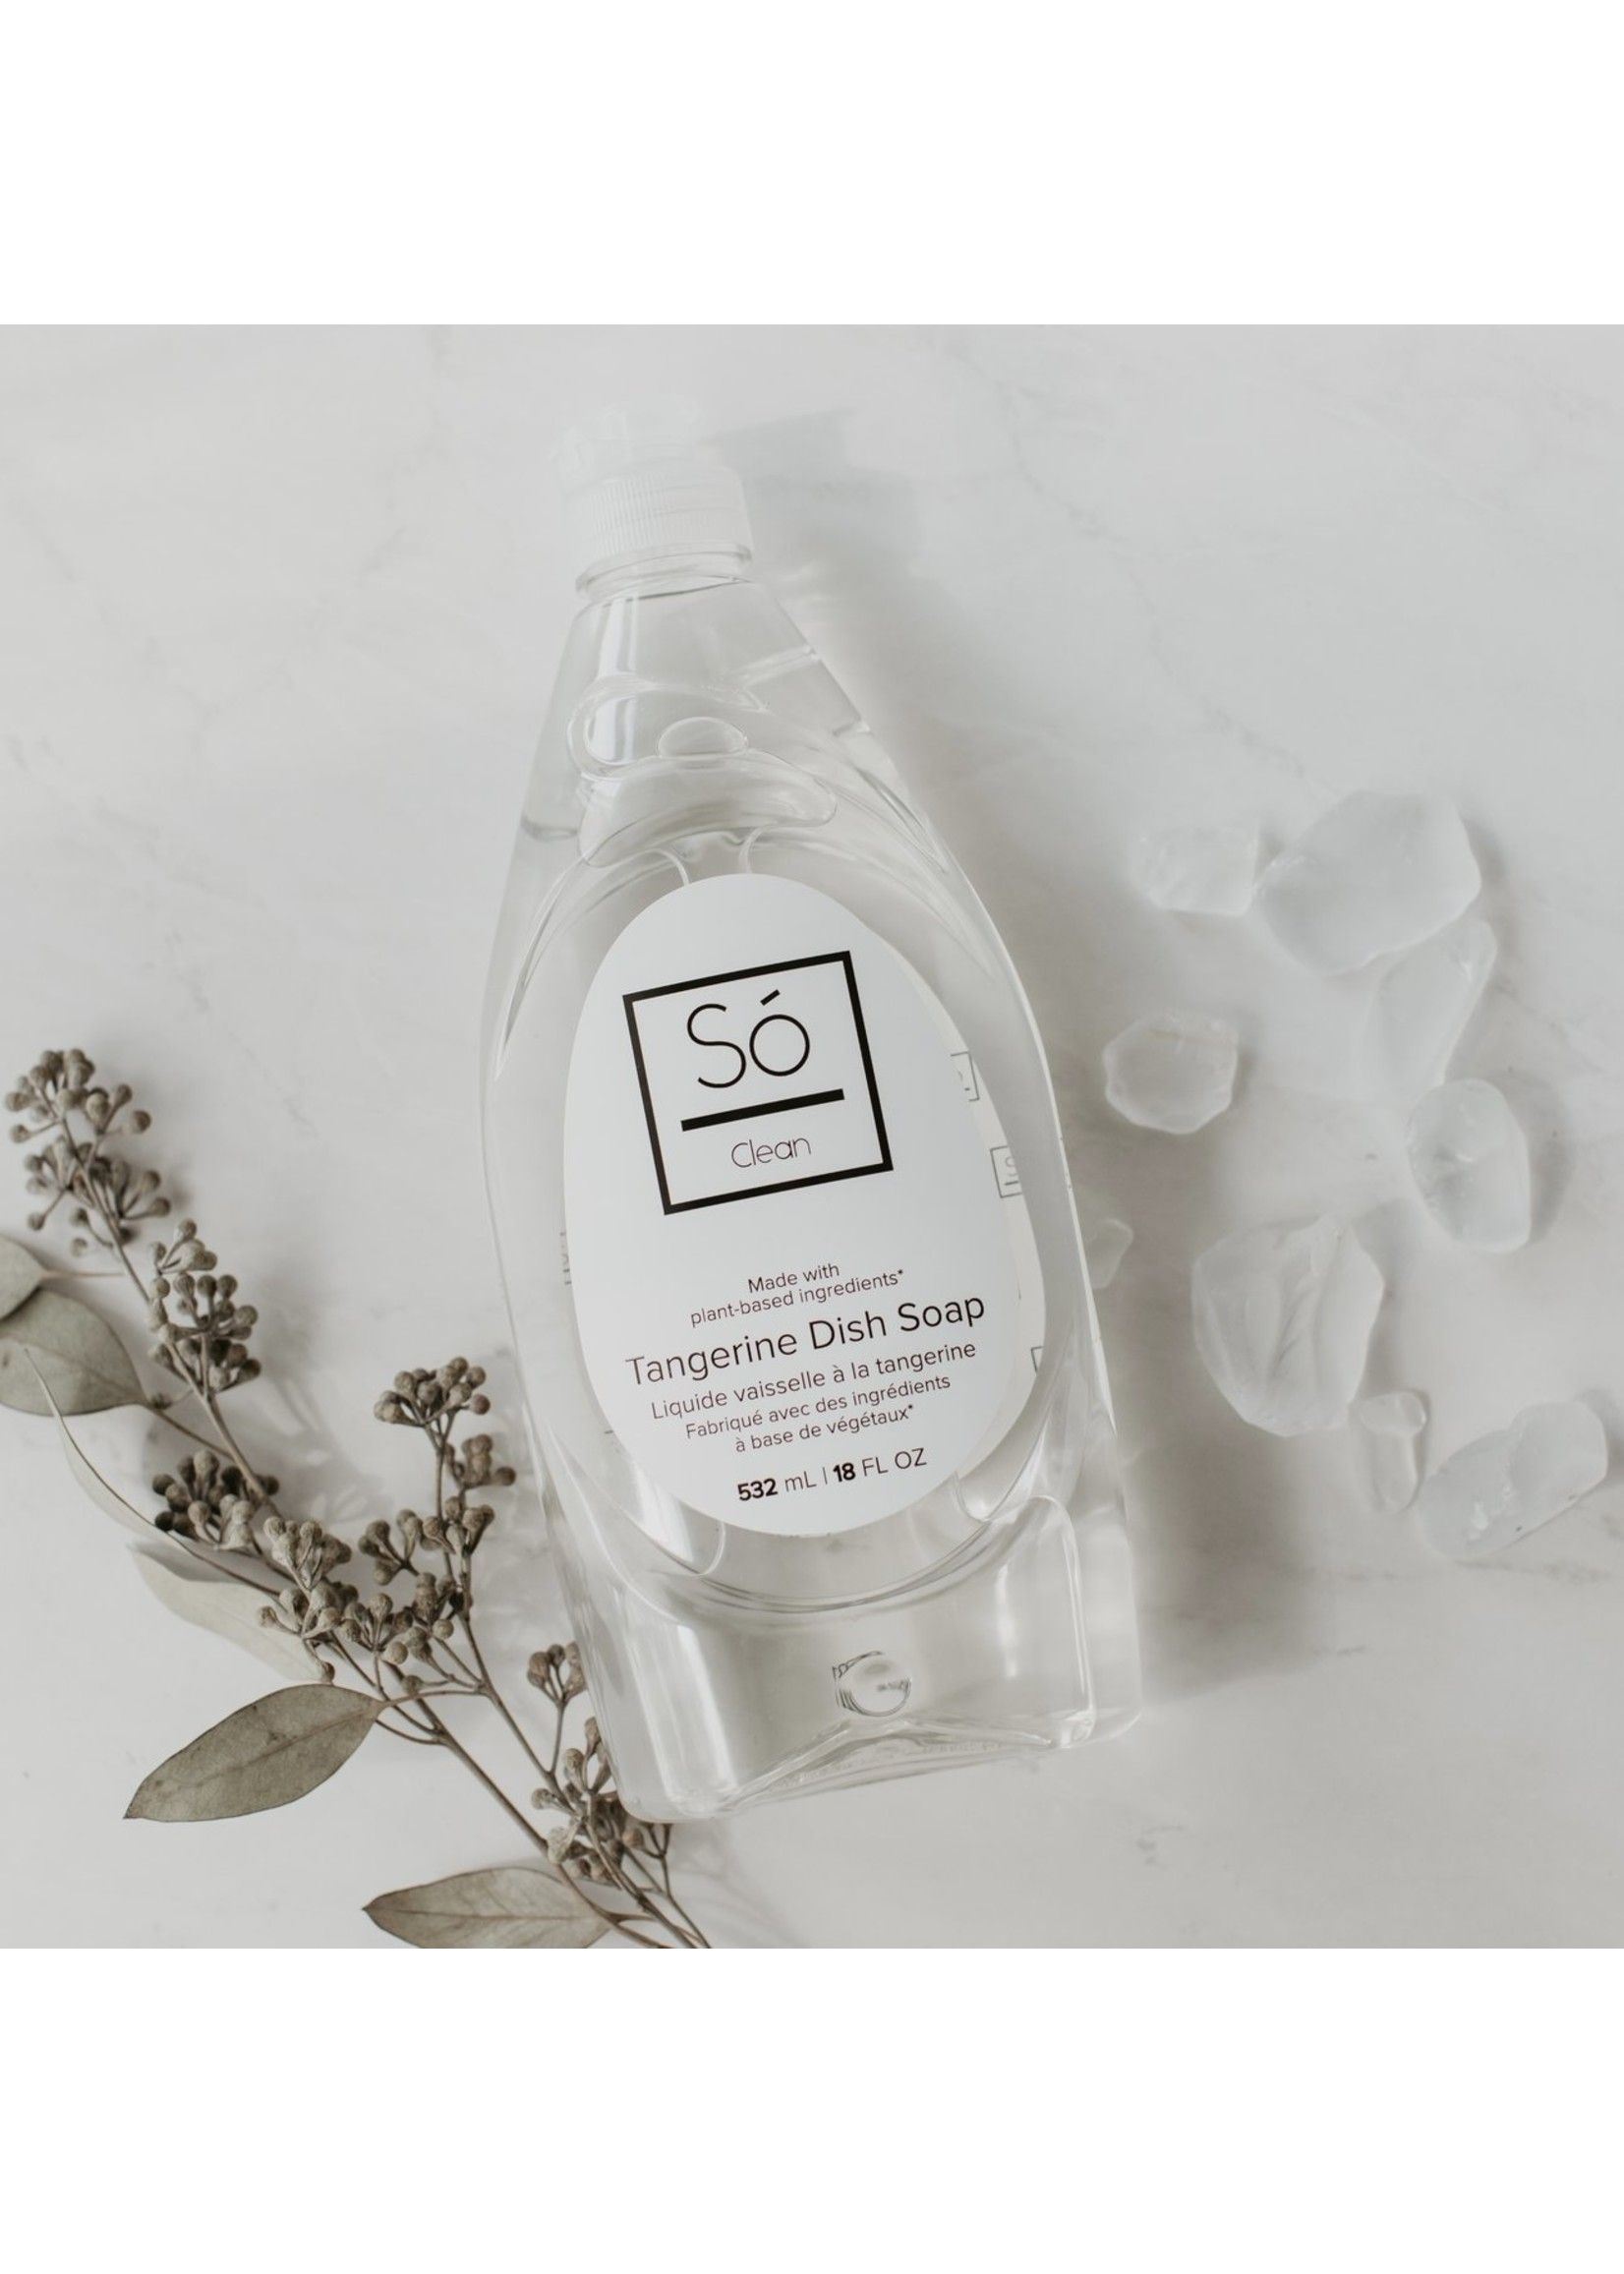 So Luxury Clean - Tangerine Dish Soap